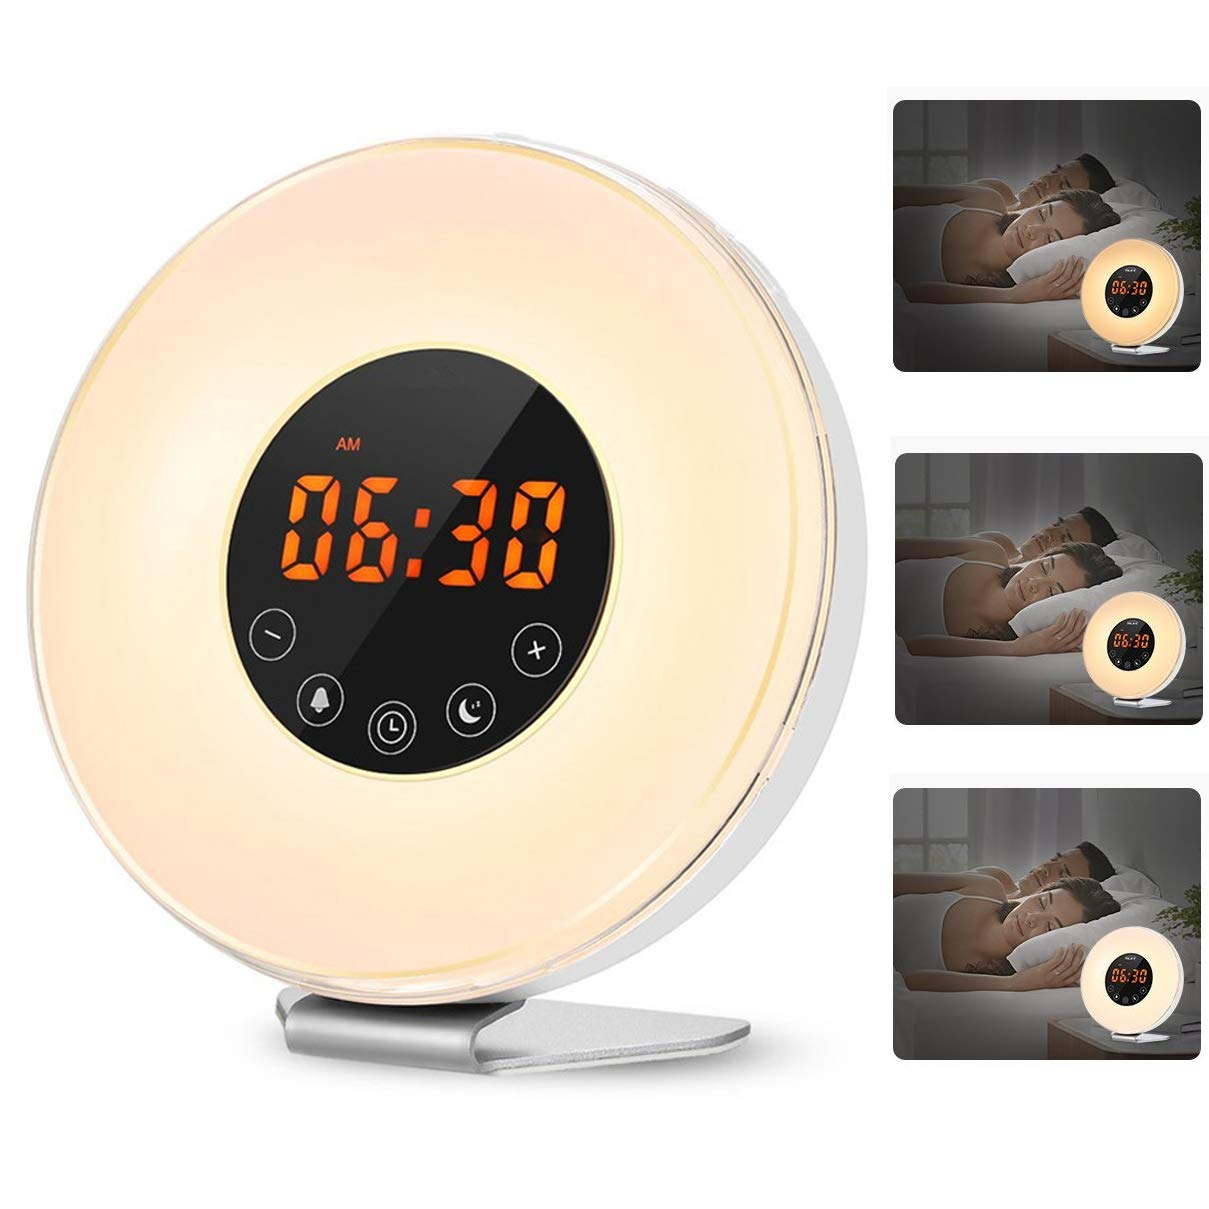 Apiker Sunrise Alarm Clock with Sunrise Simulation and Sunset Simulation Upgraded Version Bedside Colorful Night Light with Snooze Function Wake up Light 6 Nature Sounds FM Radio